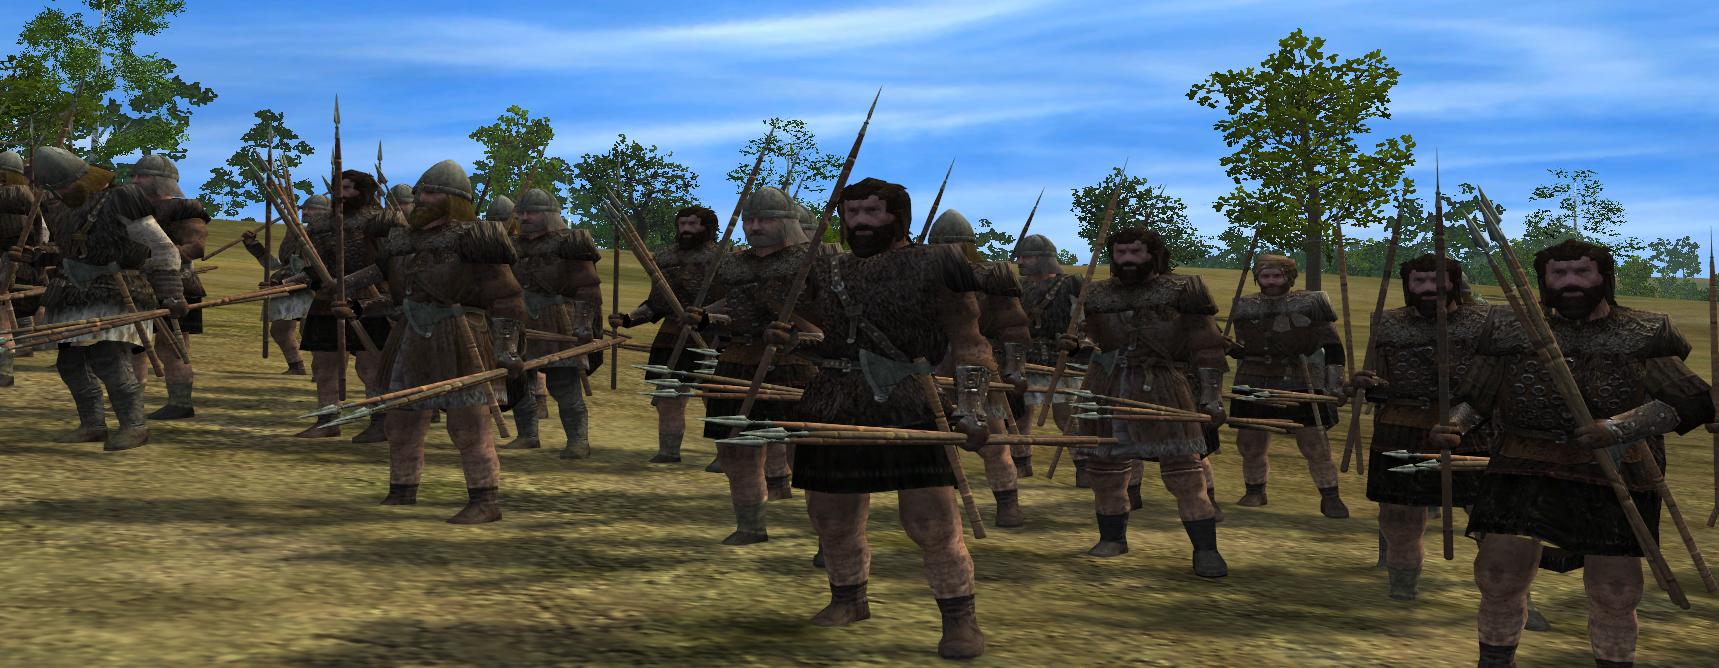 welsh skirmishers